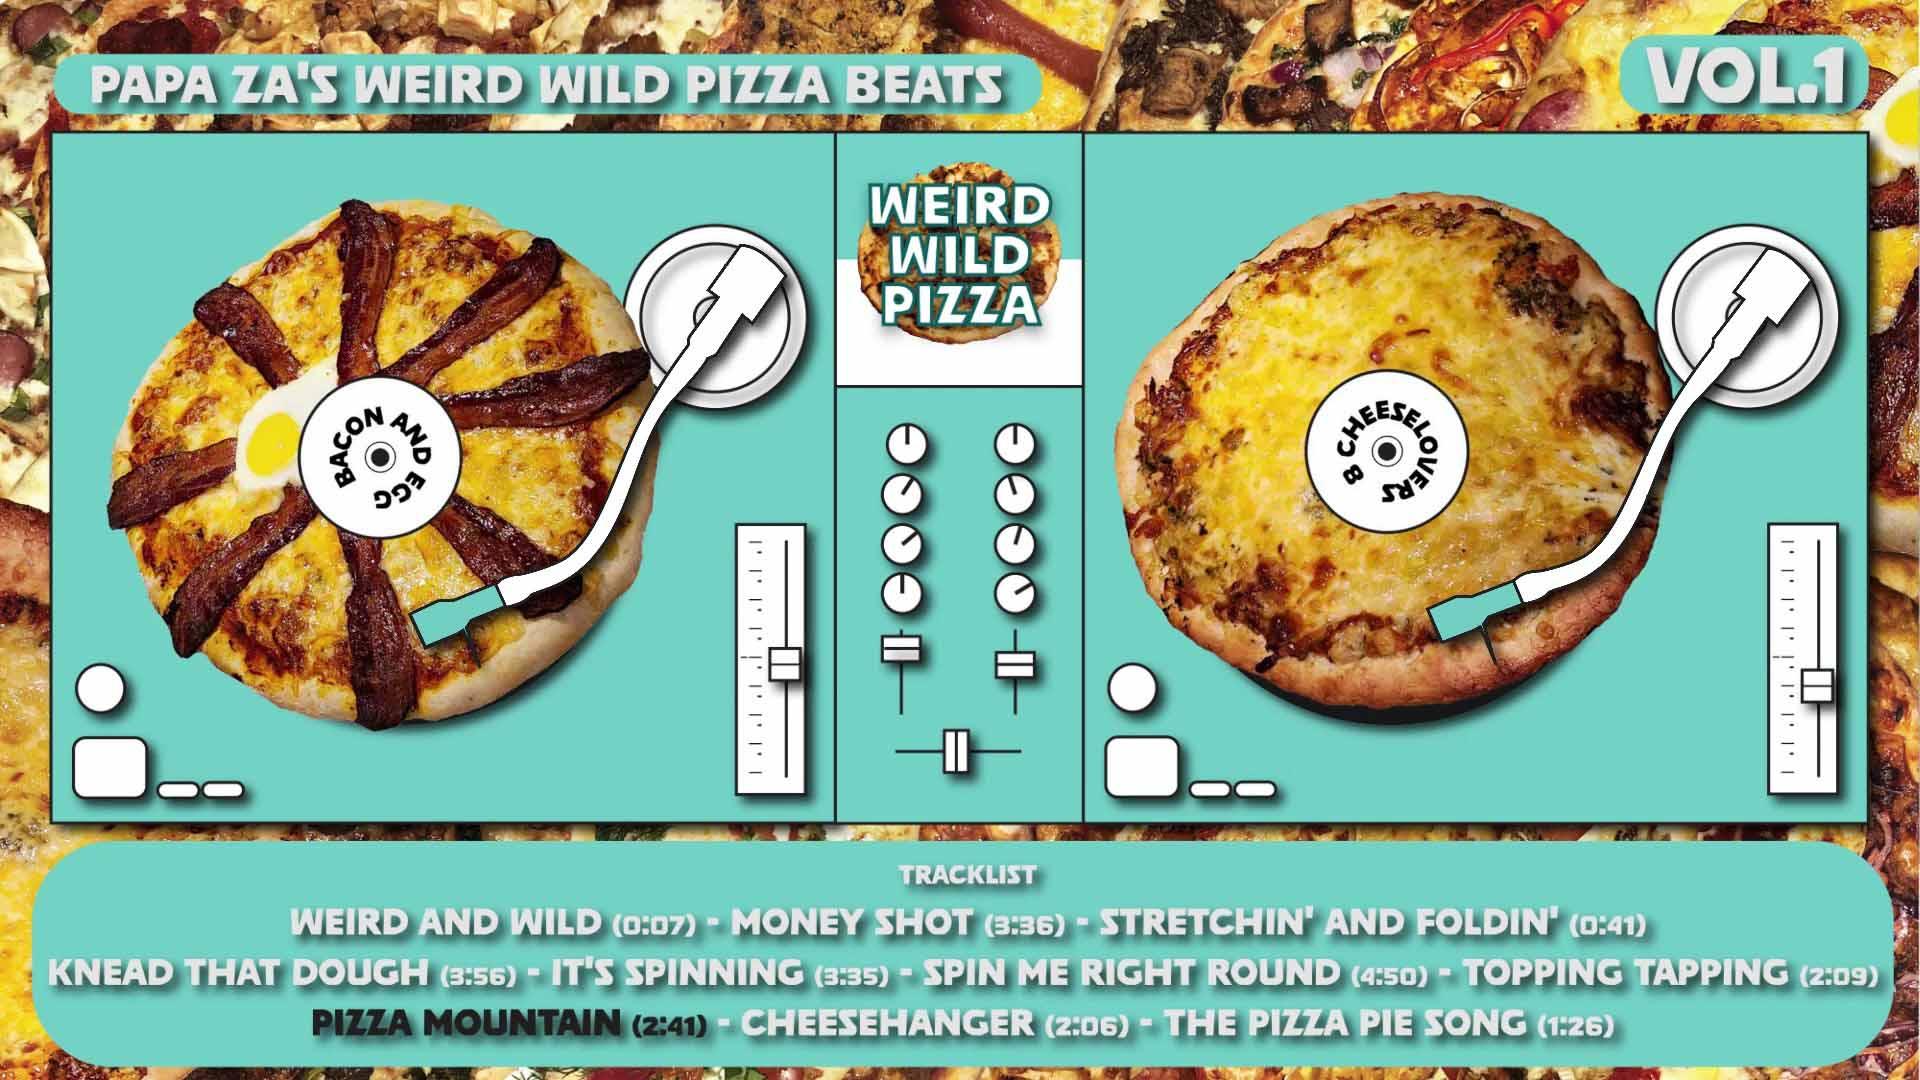 Papa Za's Weird Wild Pizza Beats